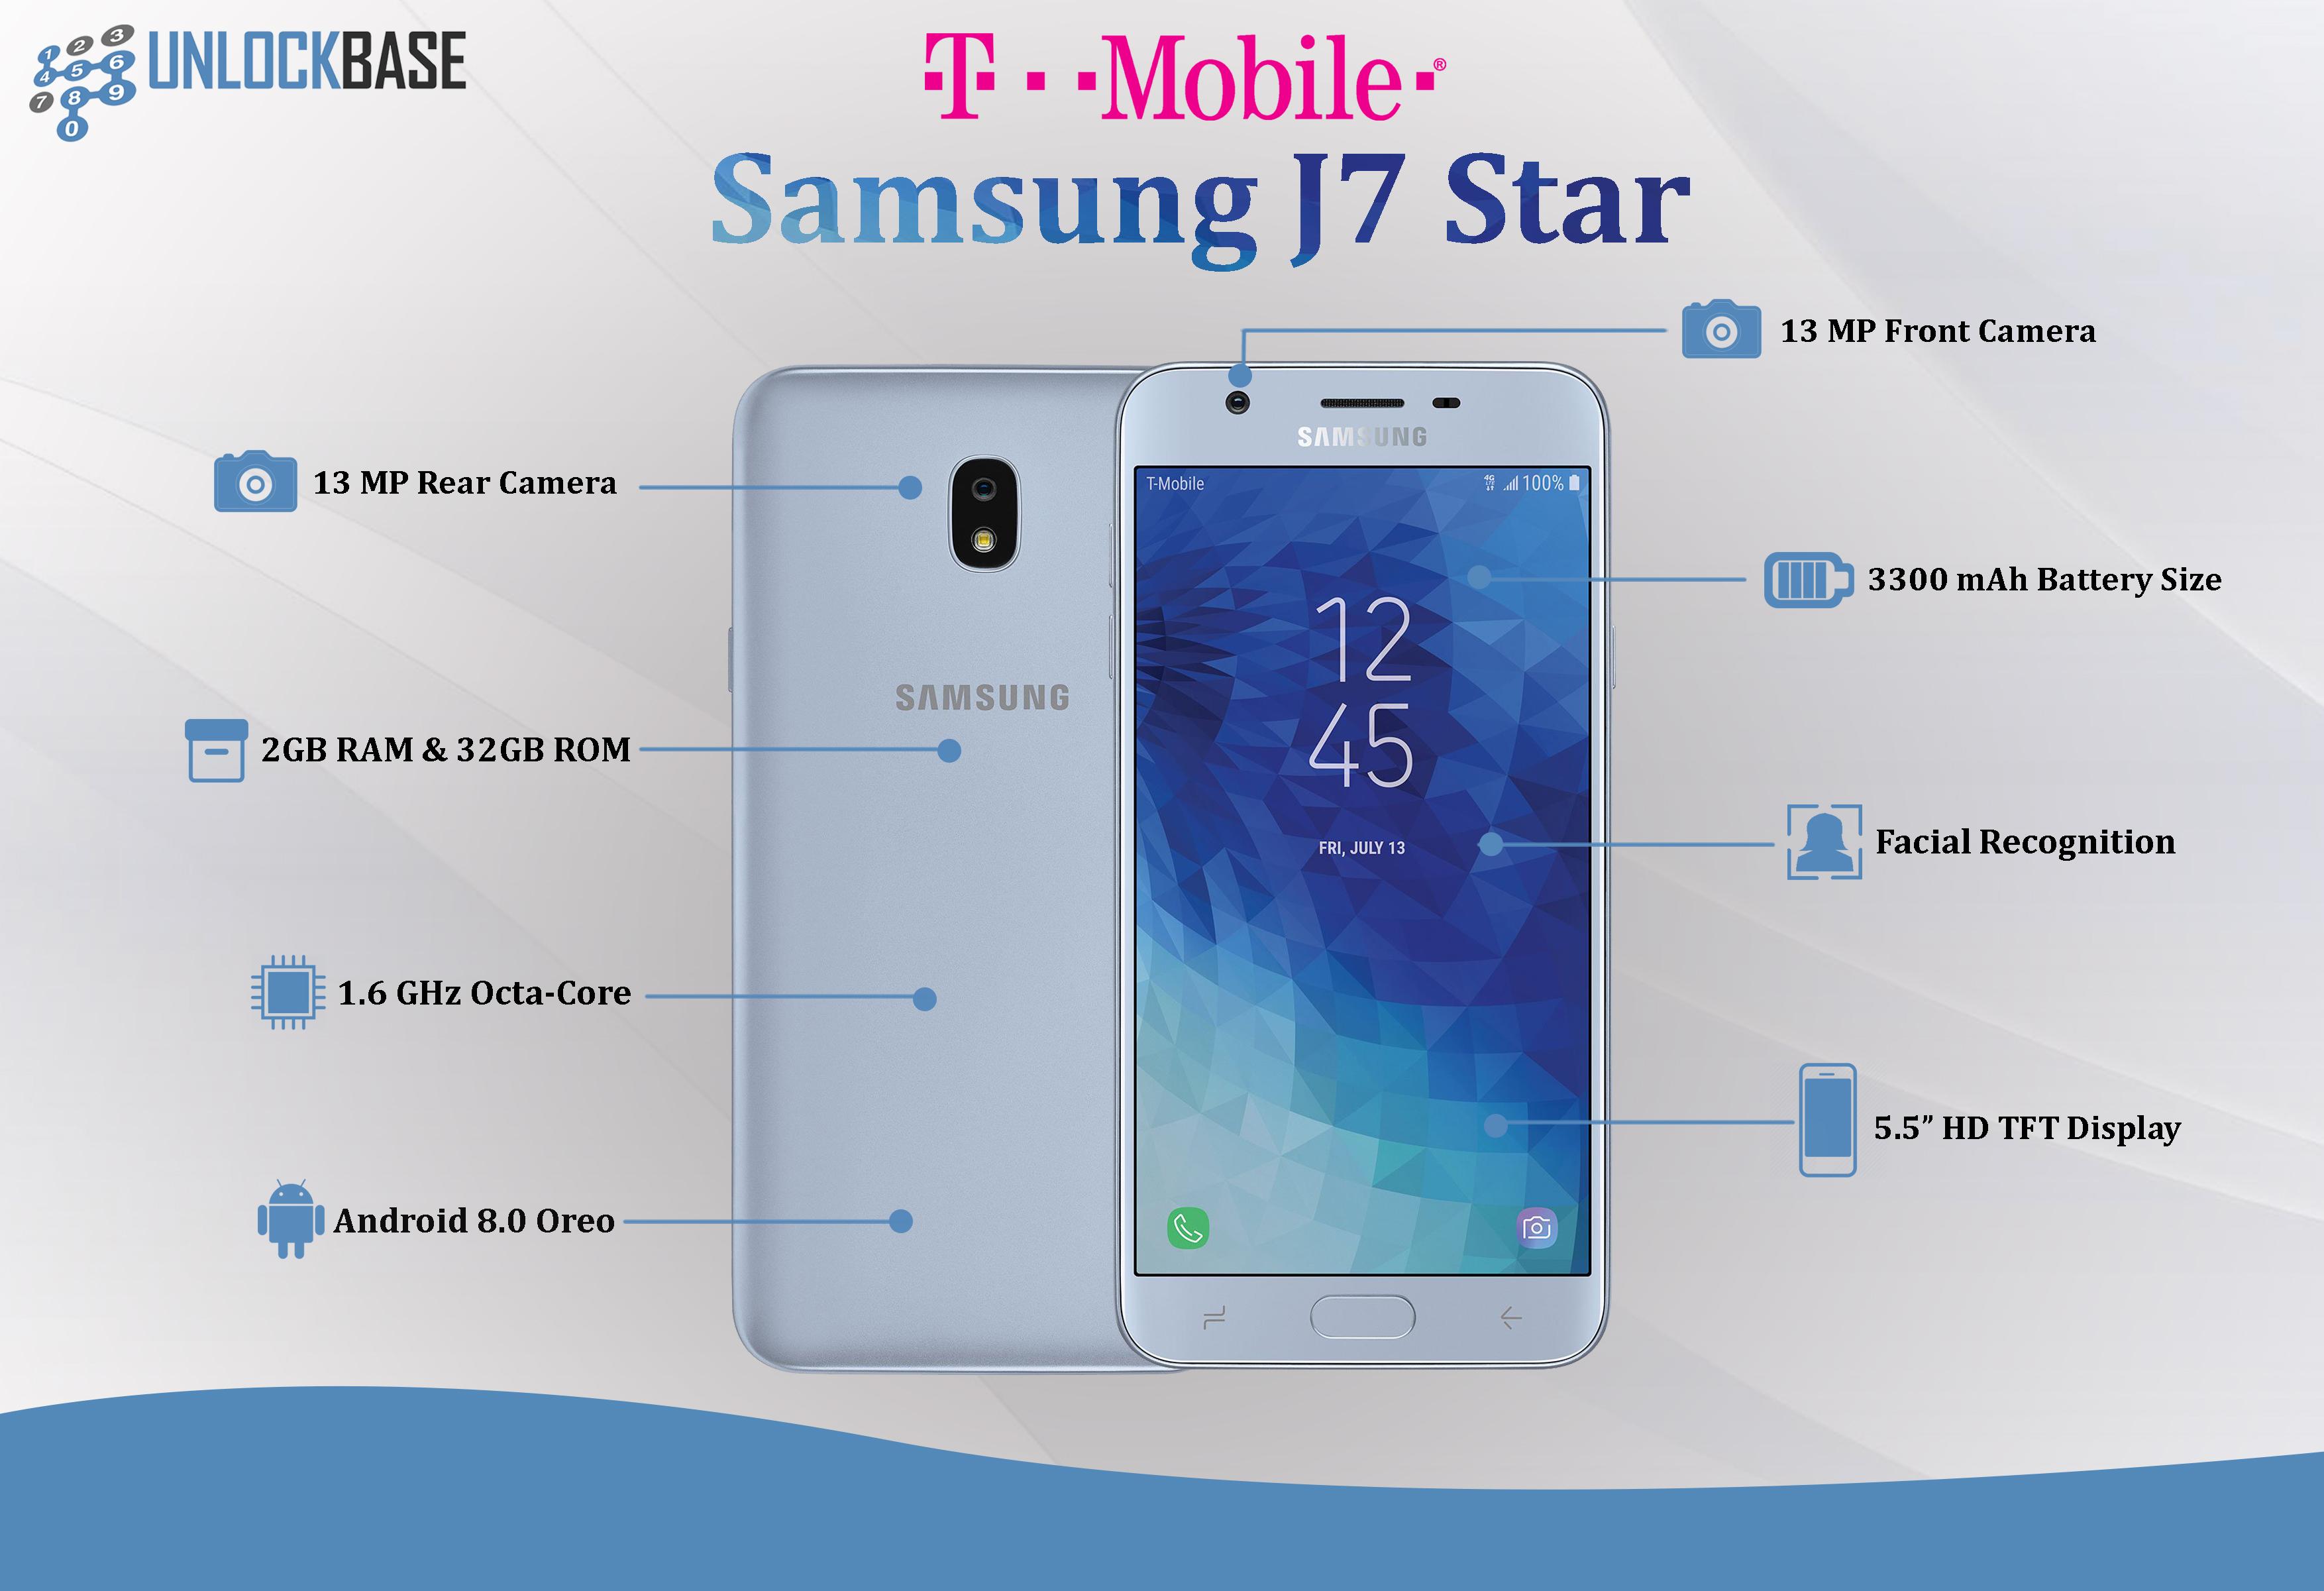 Unlocking Samsung J7 Star: Perfect Selfie Budget Phone - UnlockBase